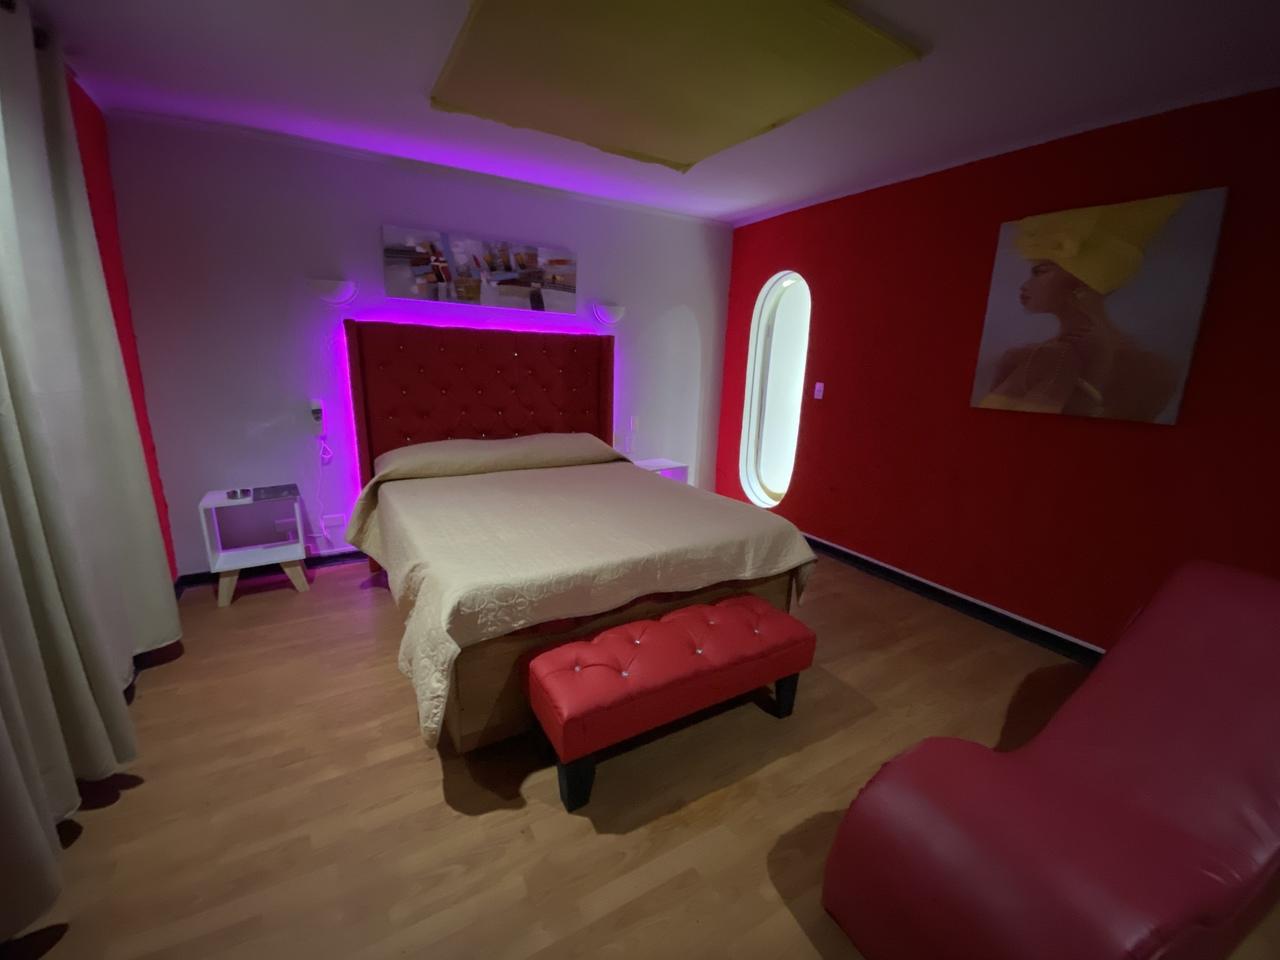 Intimo Hotel Barrio Brasil en Santiago : MotelNow